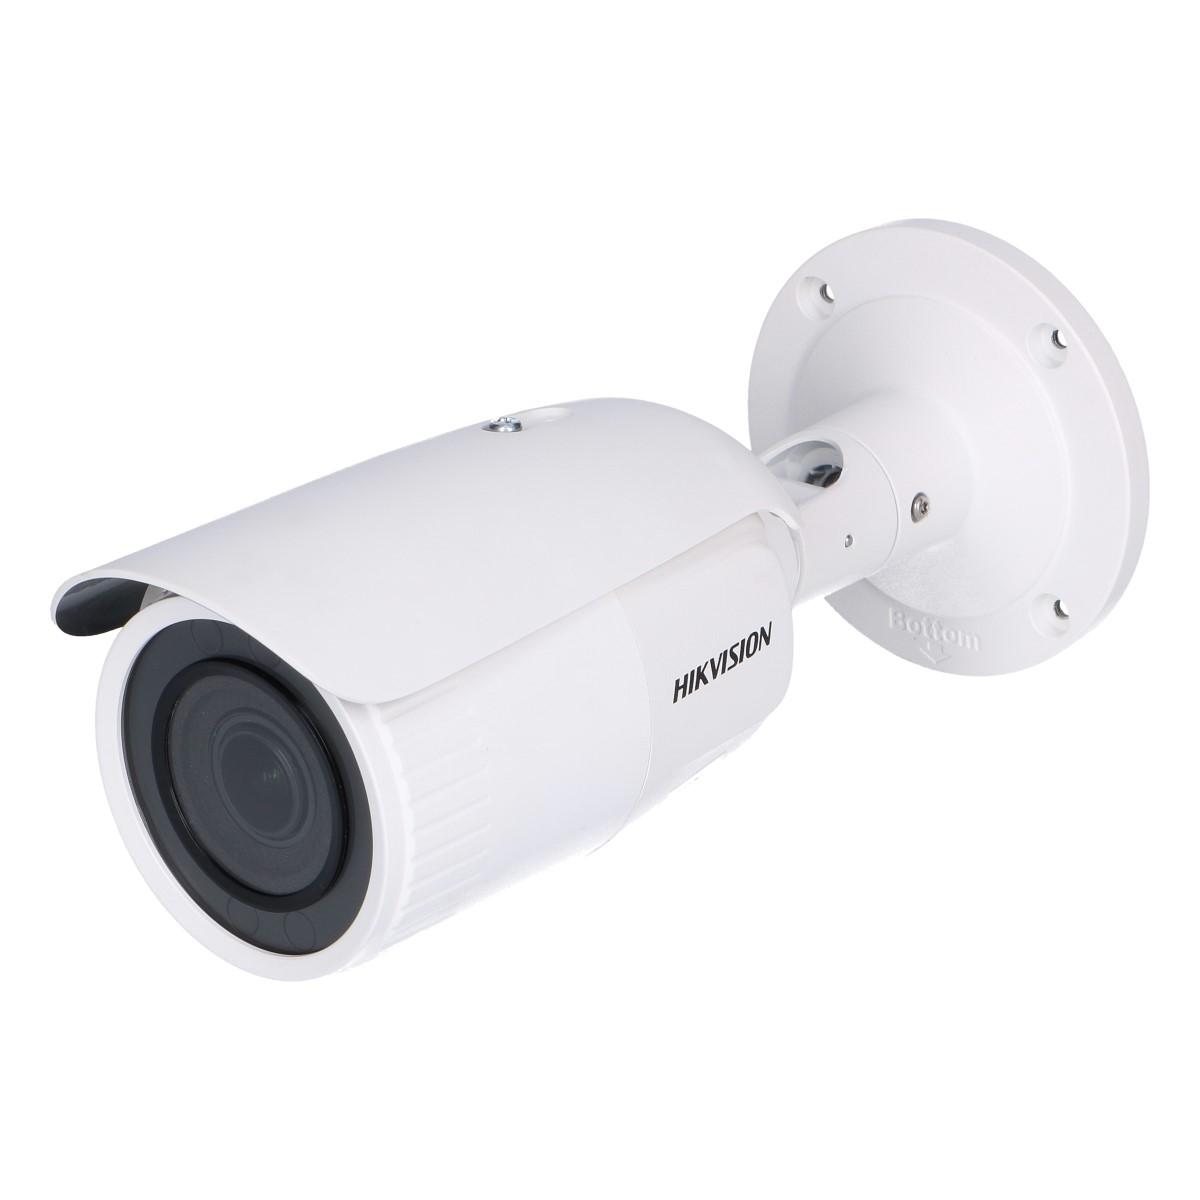 DS-2CD1643G0-I - kamera tulejowa Easy IP Lite = Hikvision